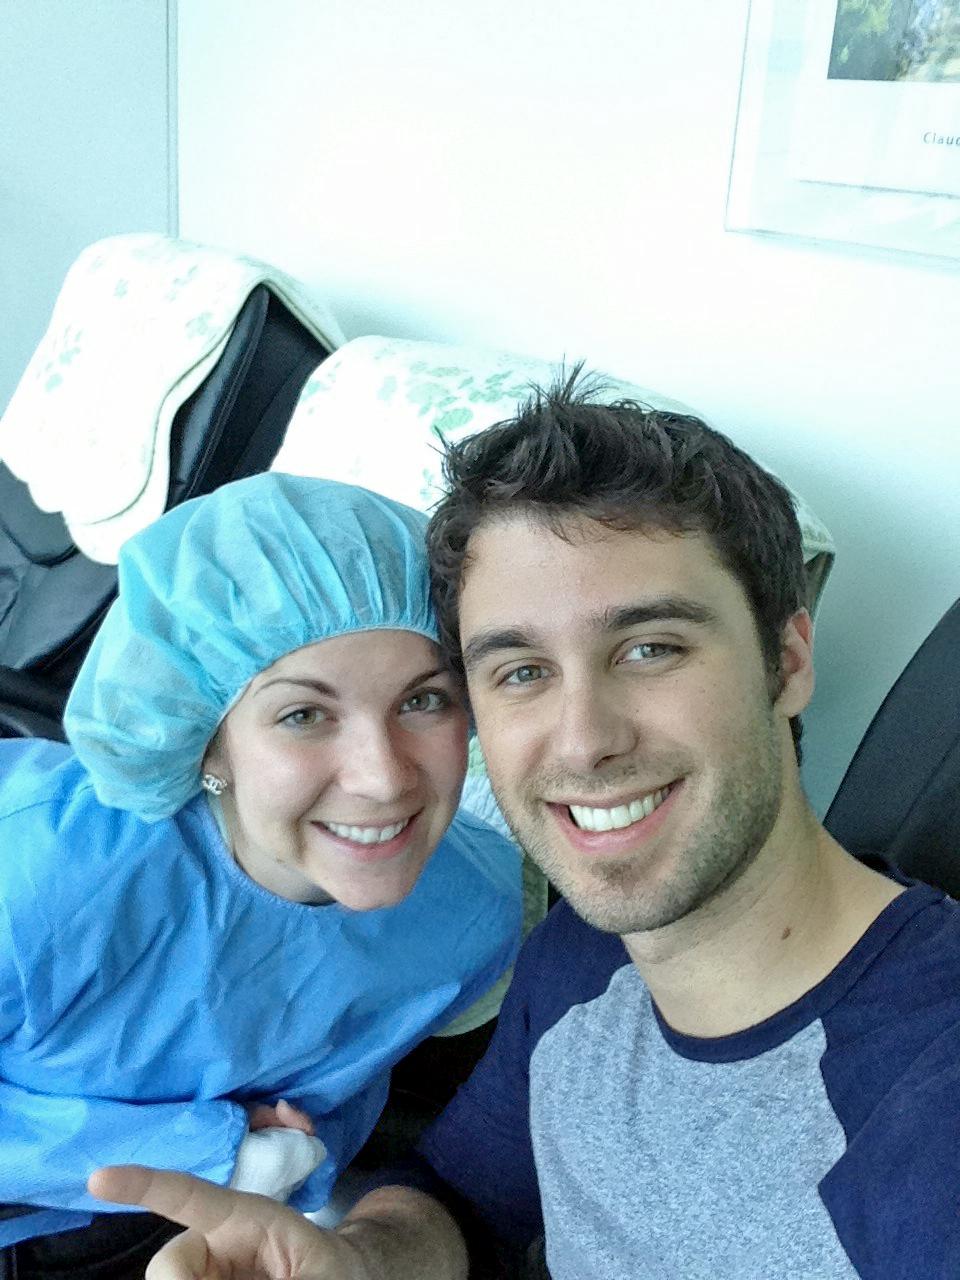 surgerytime